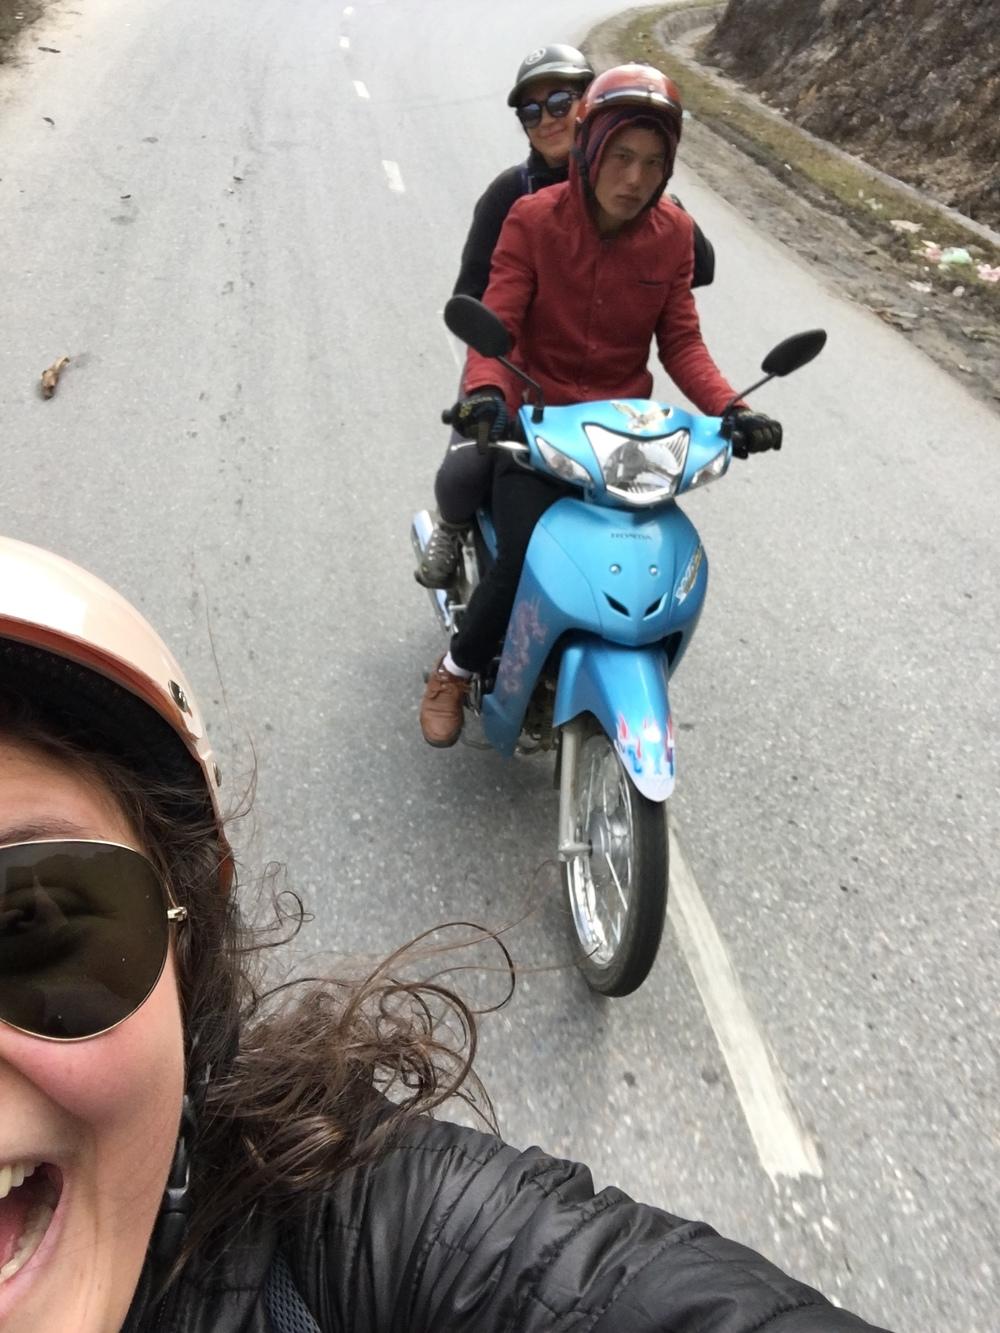 Classic motorbike selfie